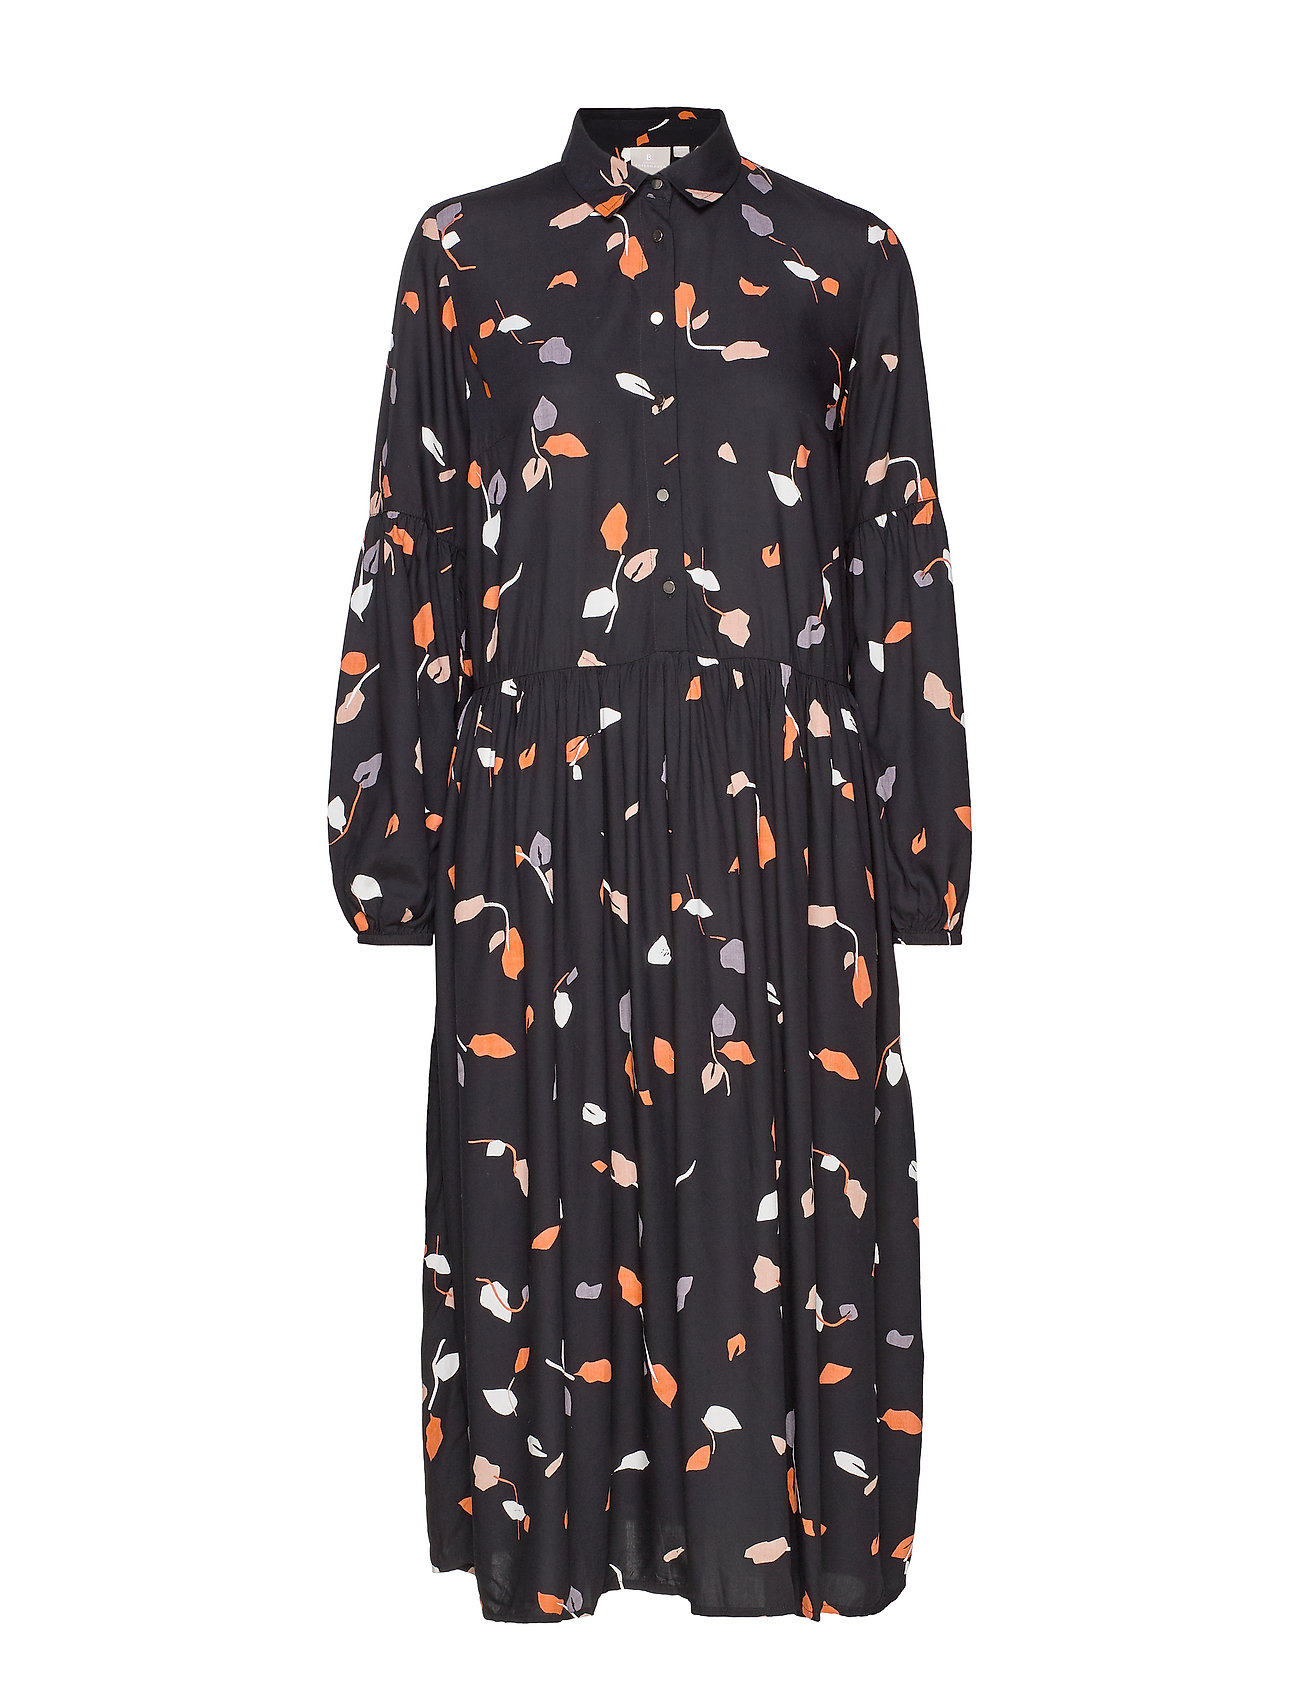 Brandtex Dress-light woven - BLACK